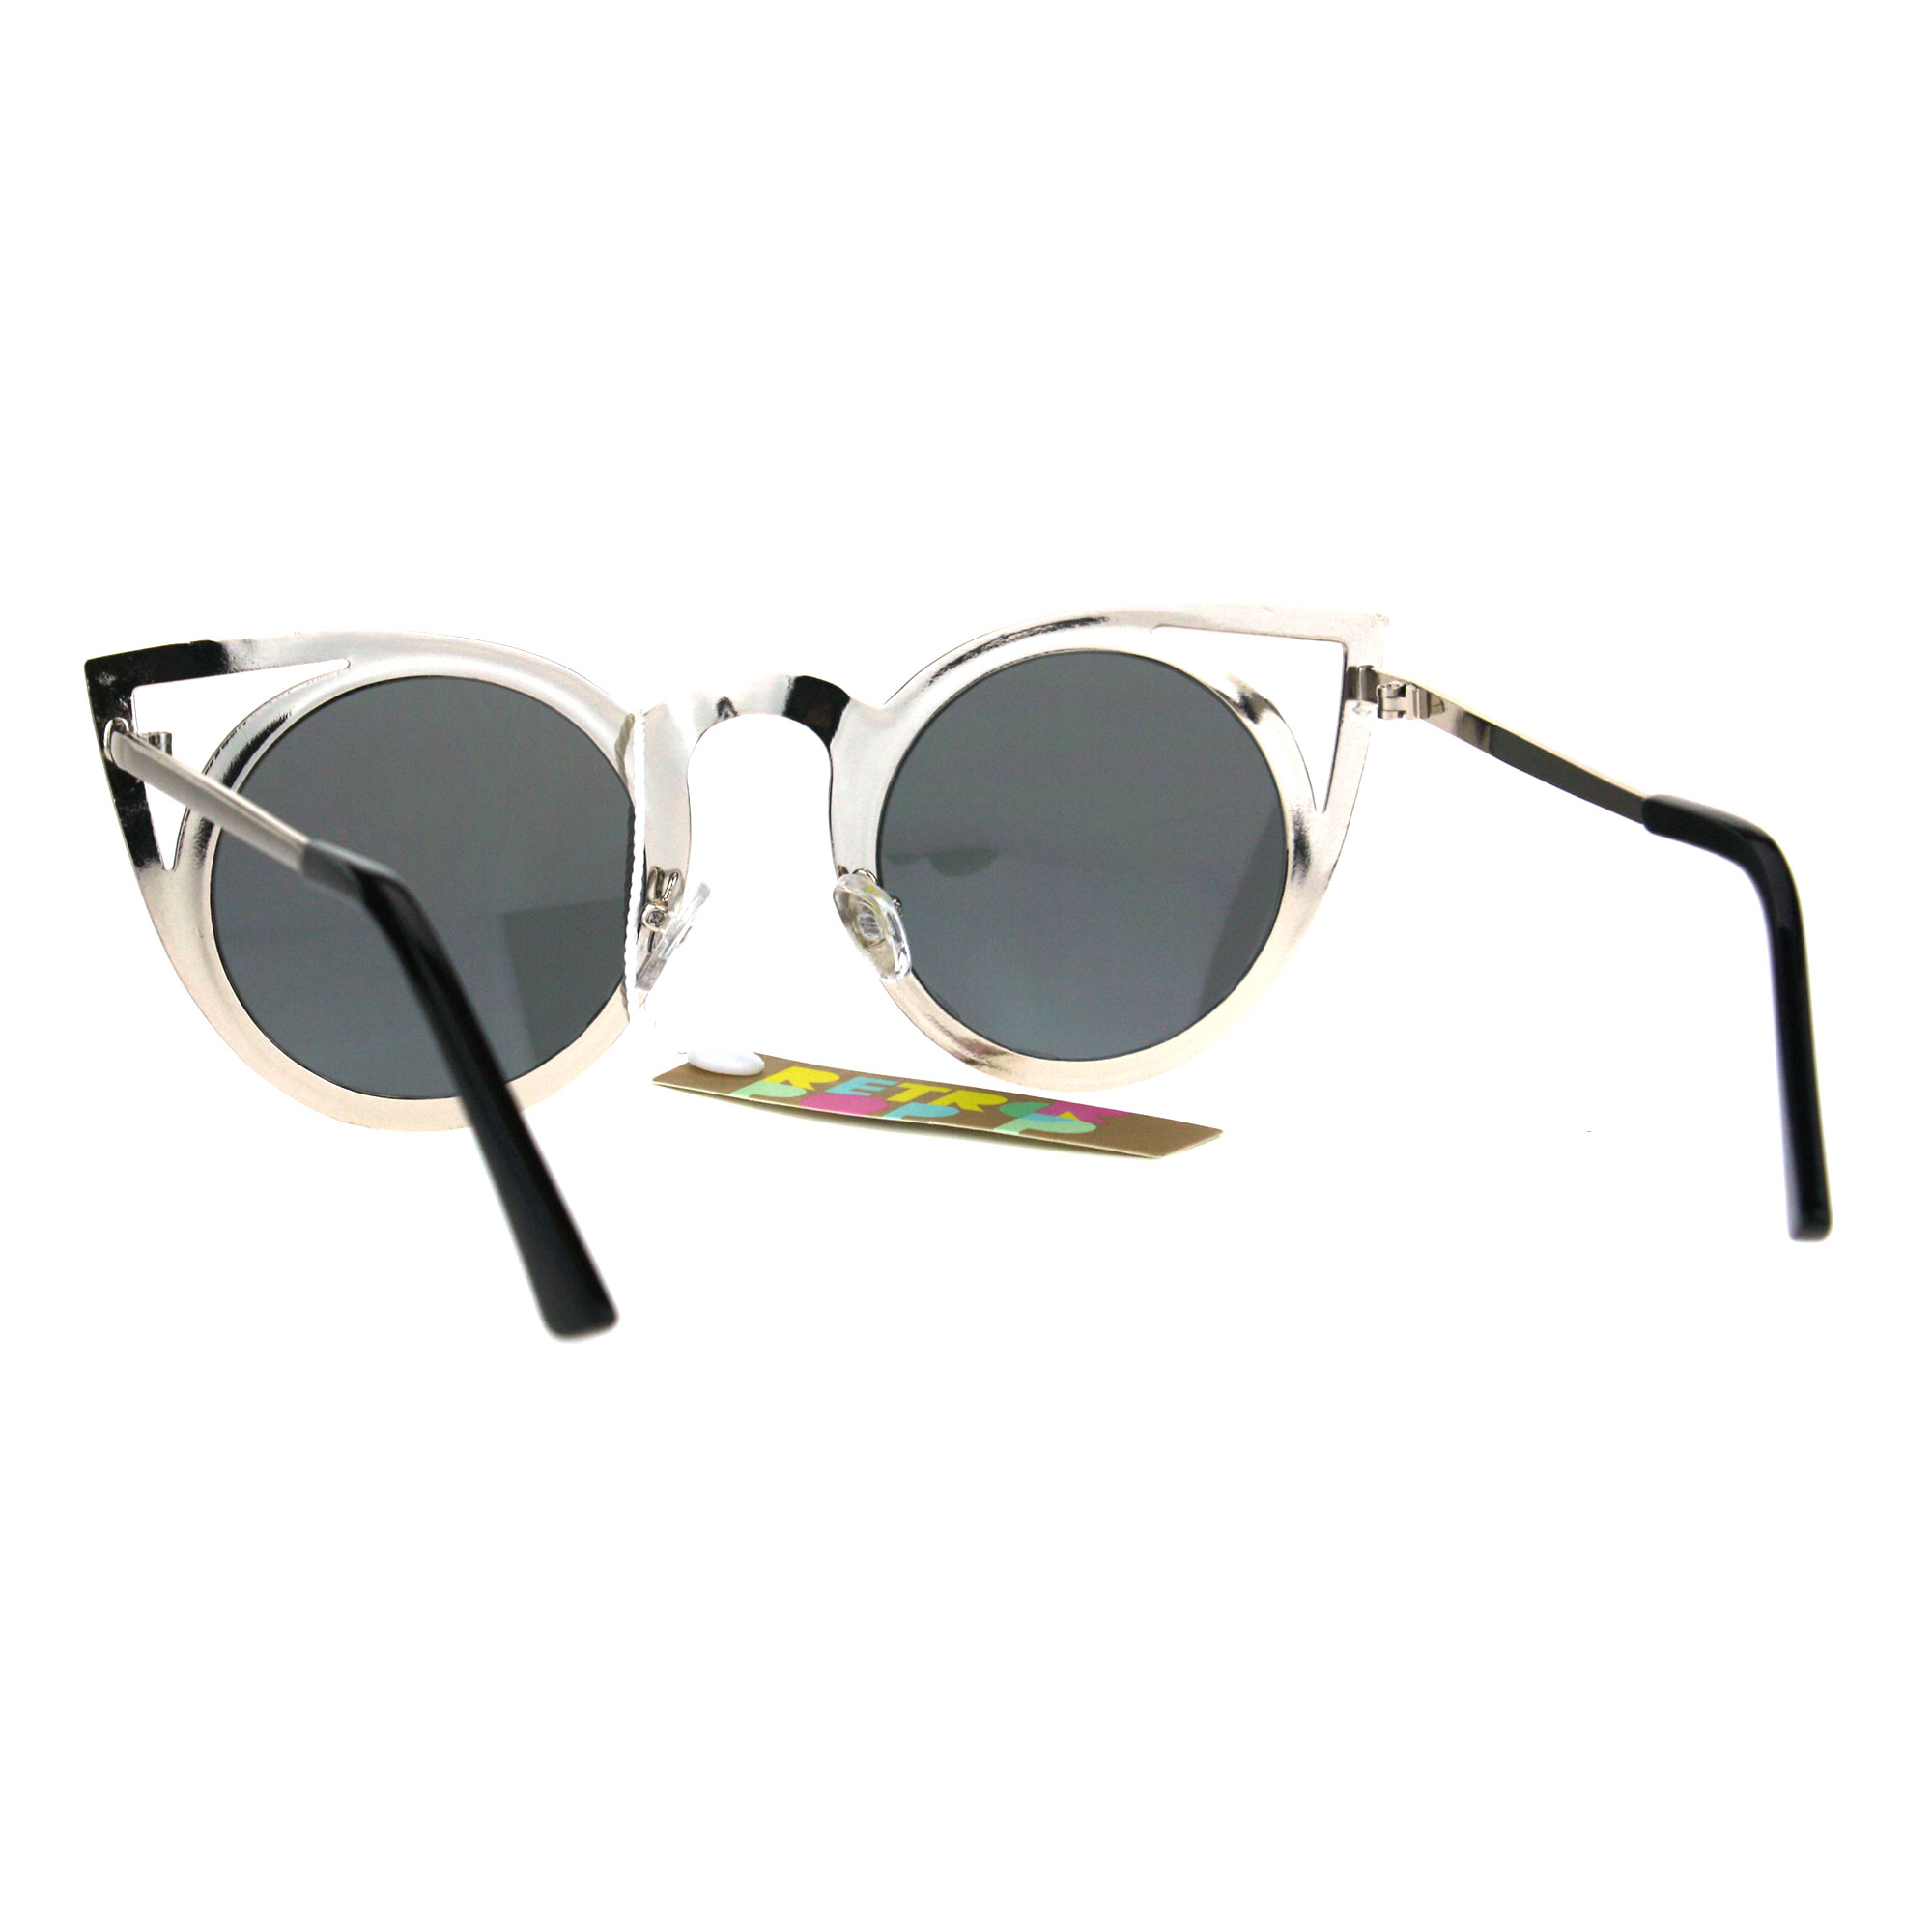 ee8e120d3 Womens Metal Bat Shape Cat Eye Round Circle Lens Sunglasses   eBay